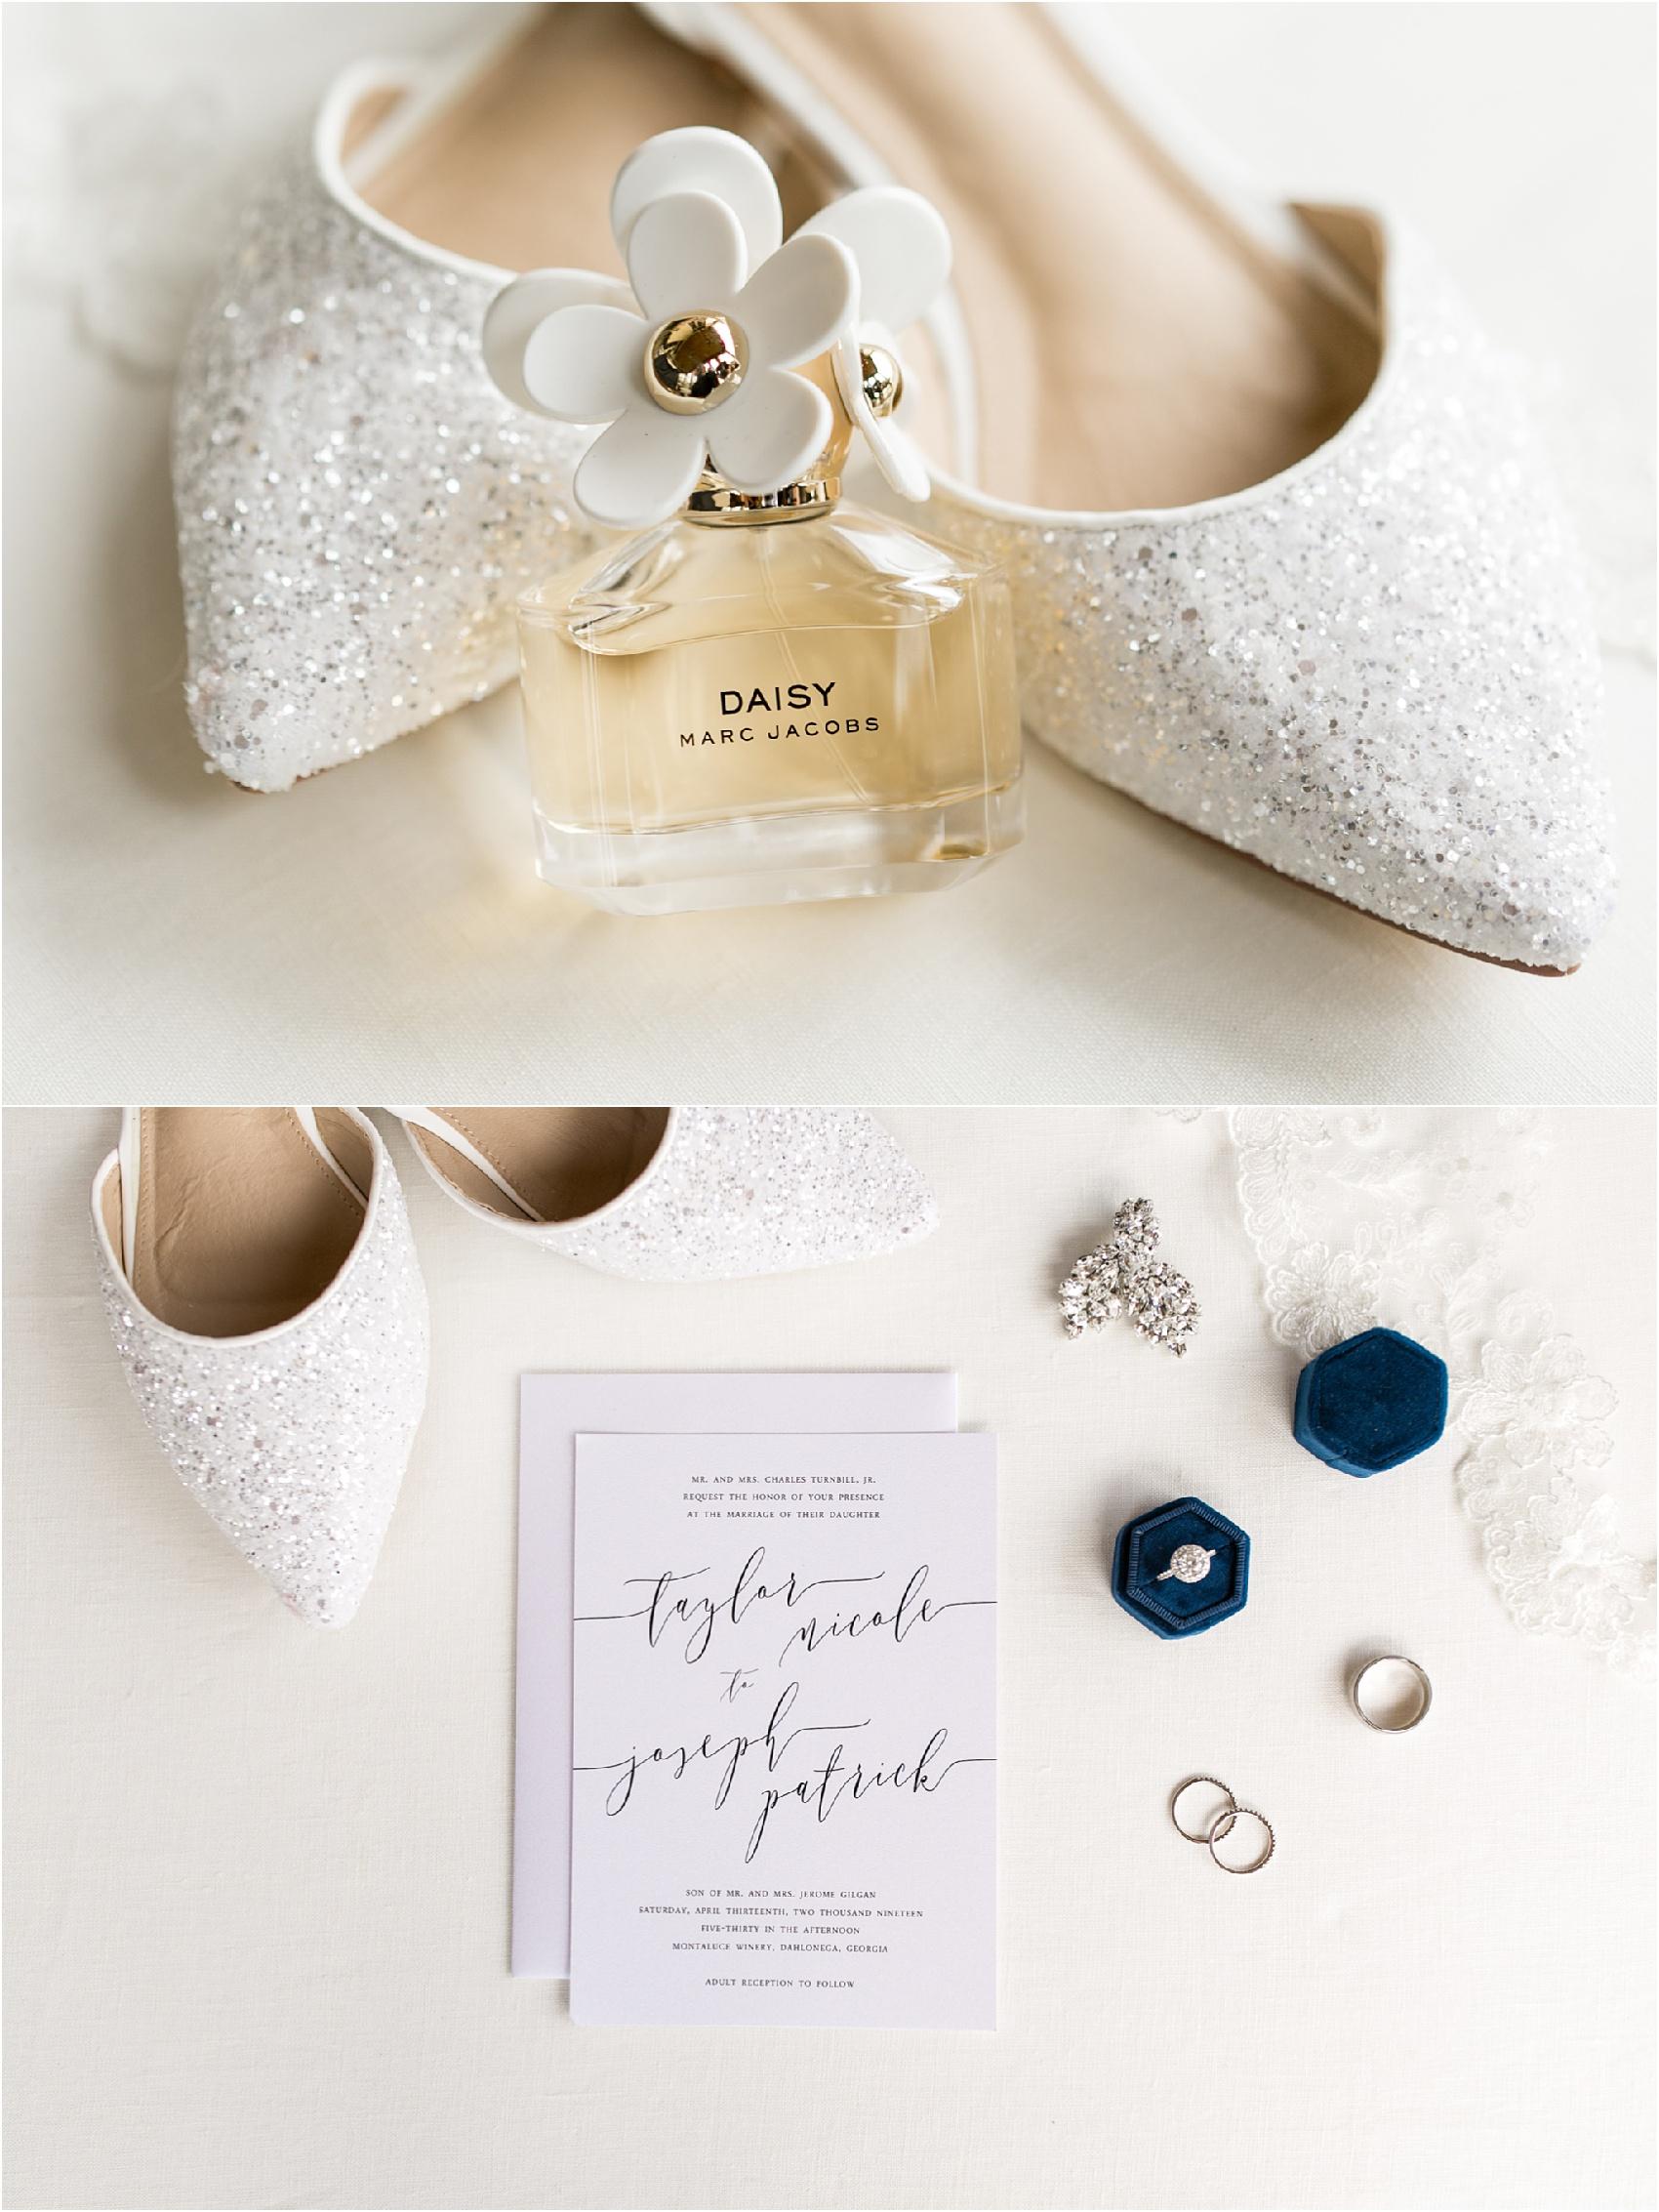 Savannah Eve Photography- Turnbill-Gilgan Wedding- Blog-6.jpg